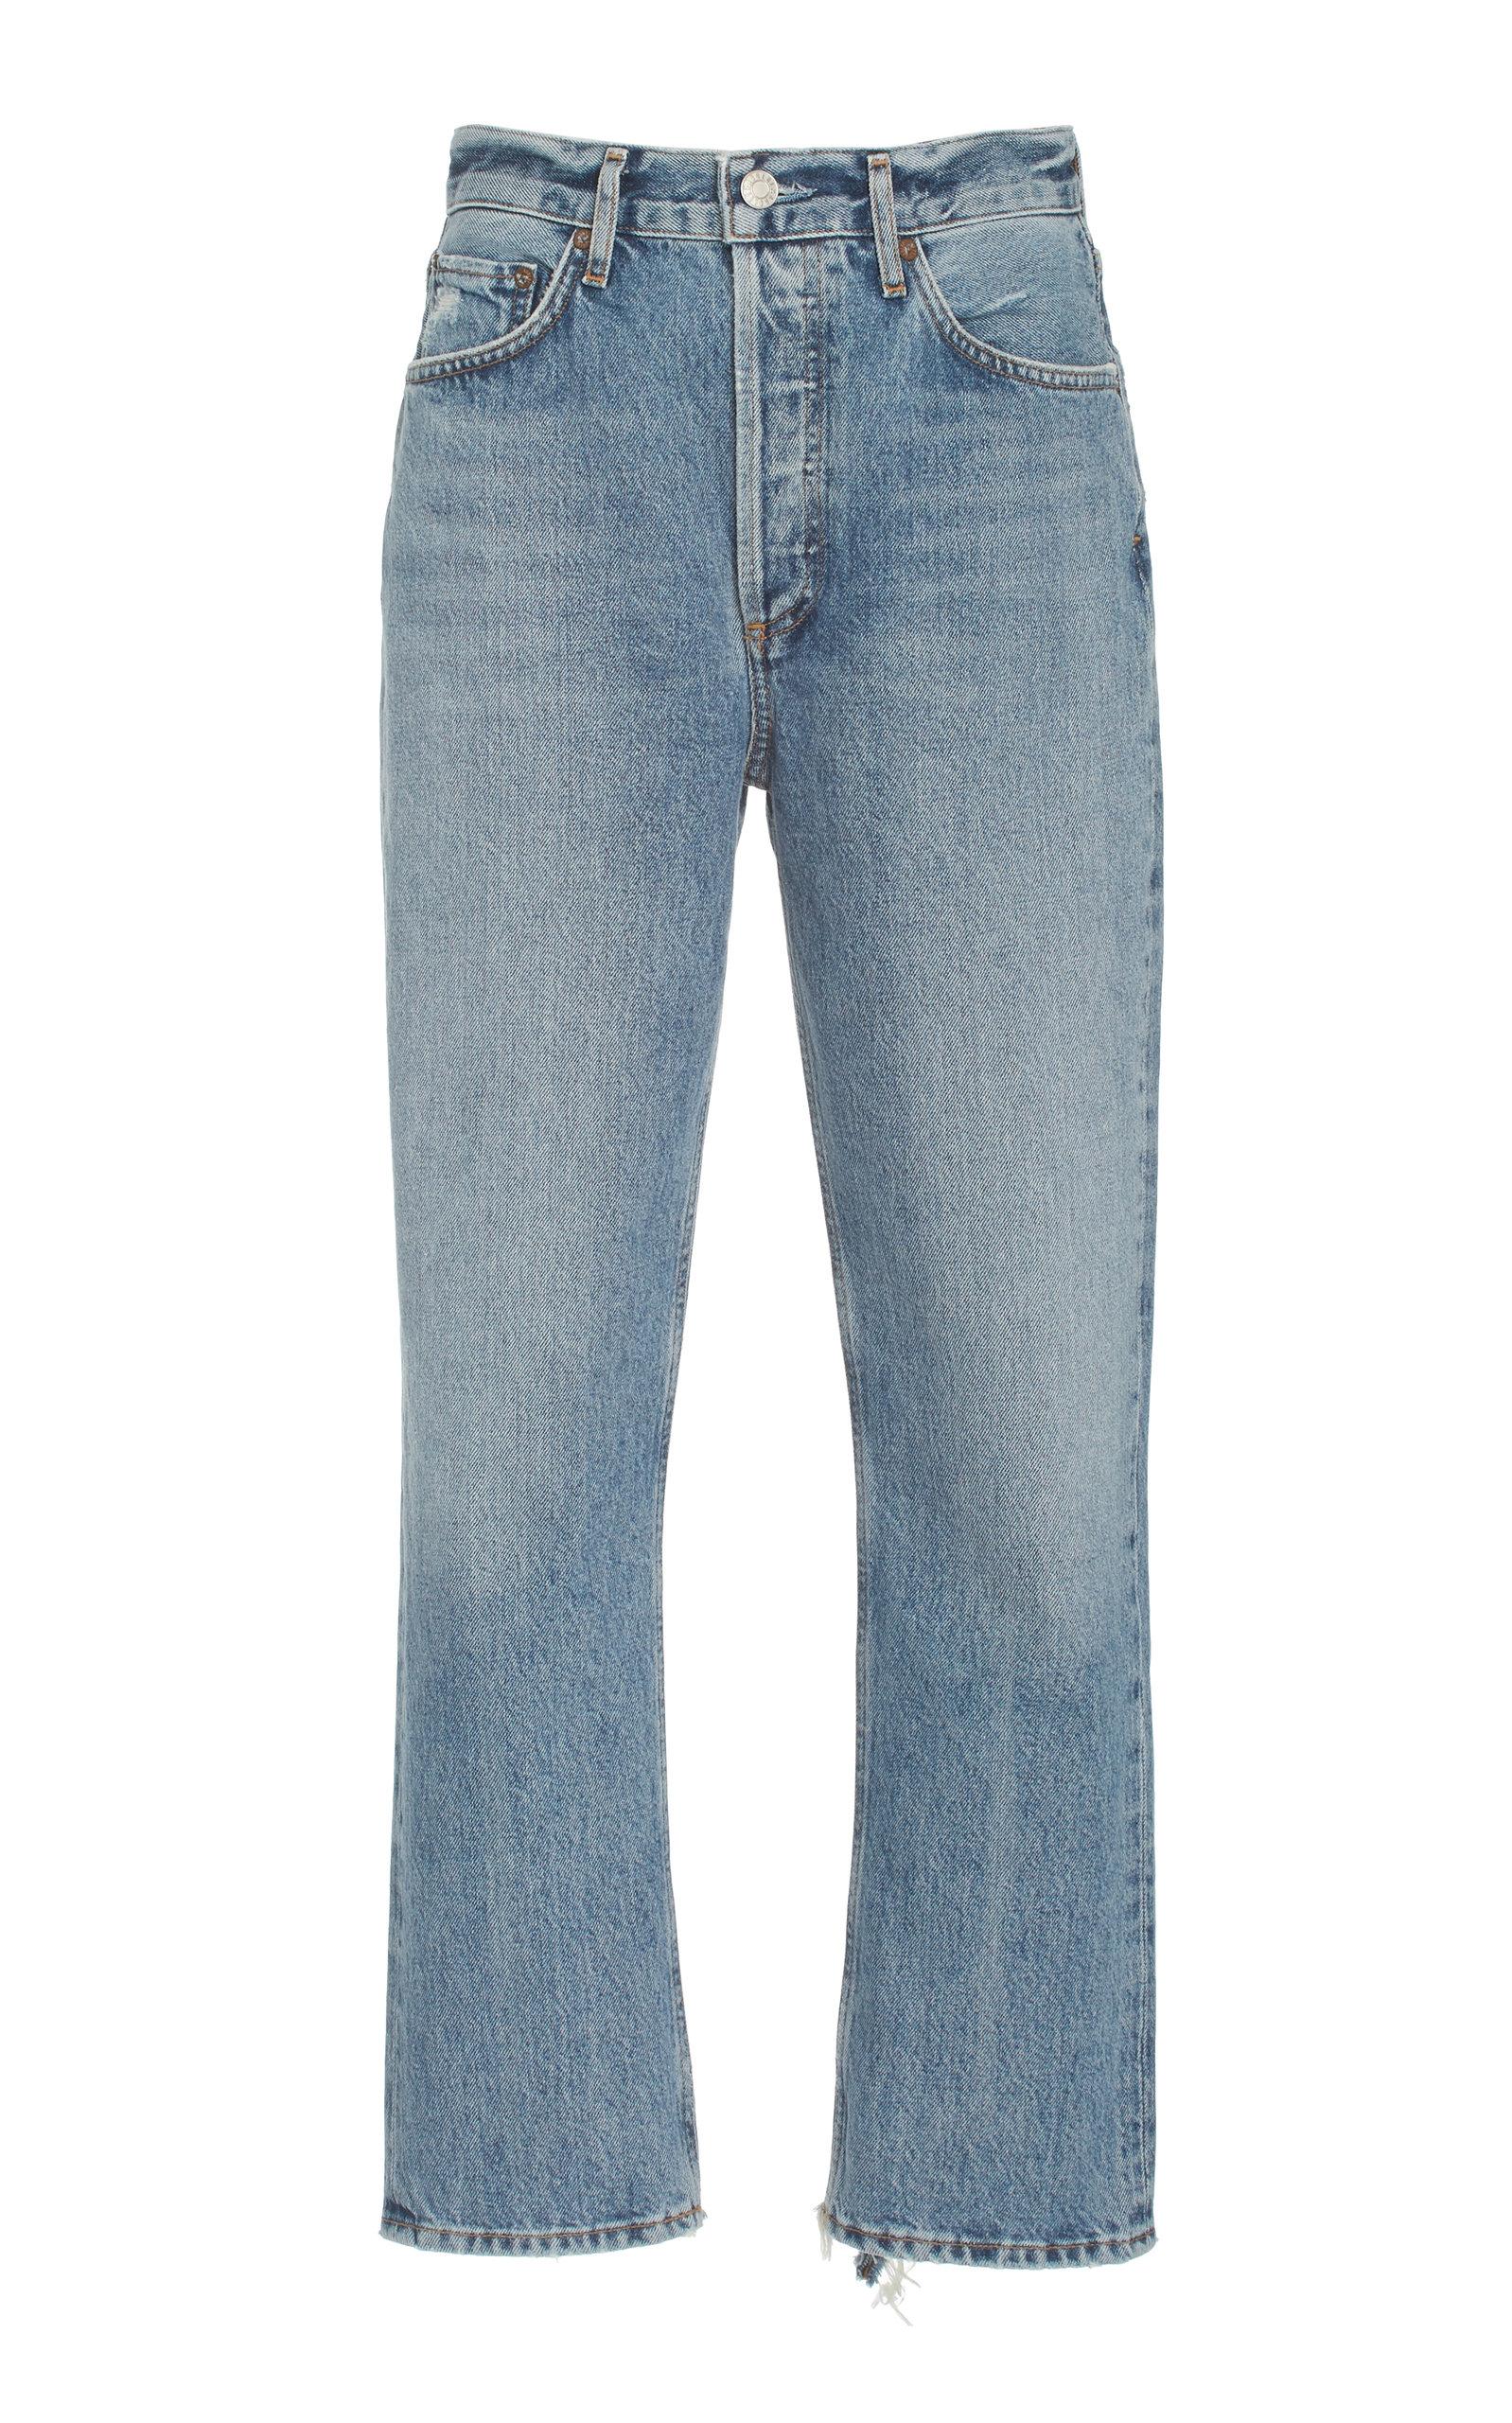 Agolde - Women's Riley Rigid High-Rise Cropped Organic Cotton Straight-Leg Jeans - Medium Wash - Moda Operandi